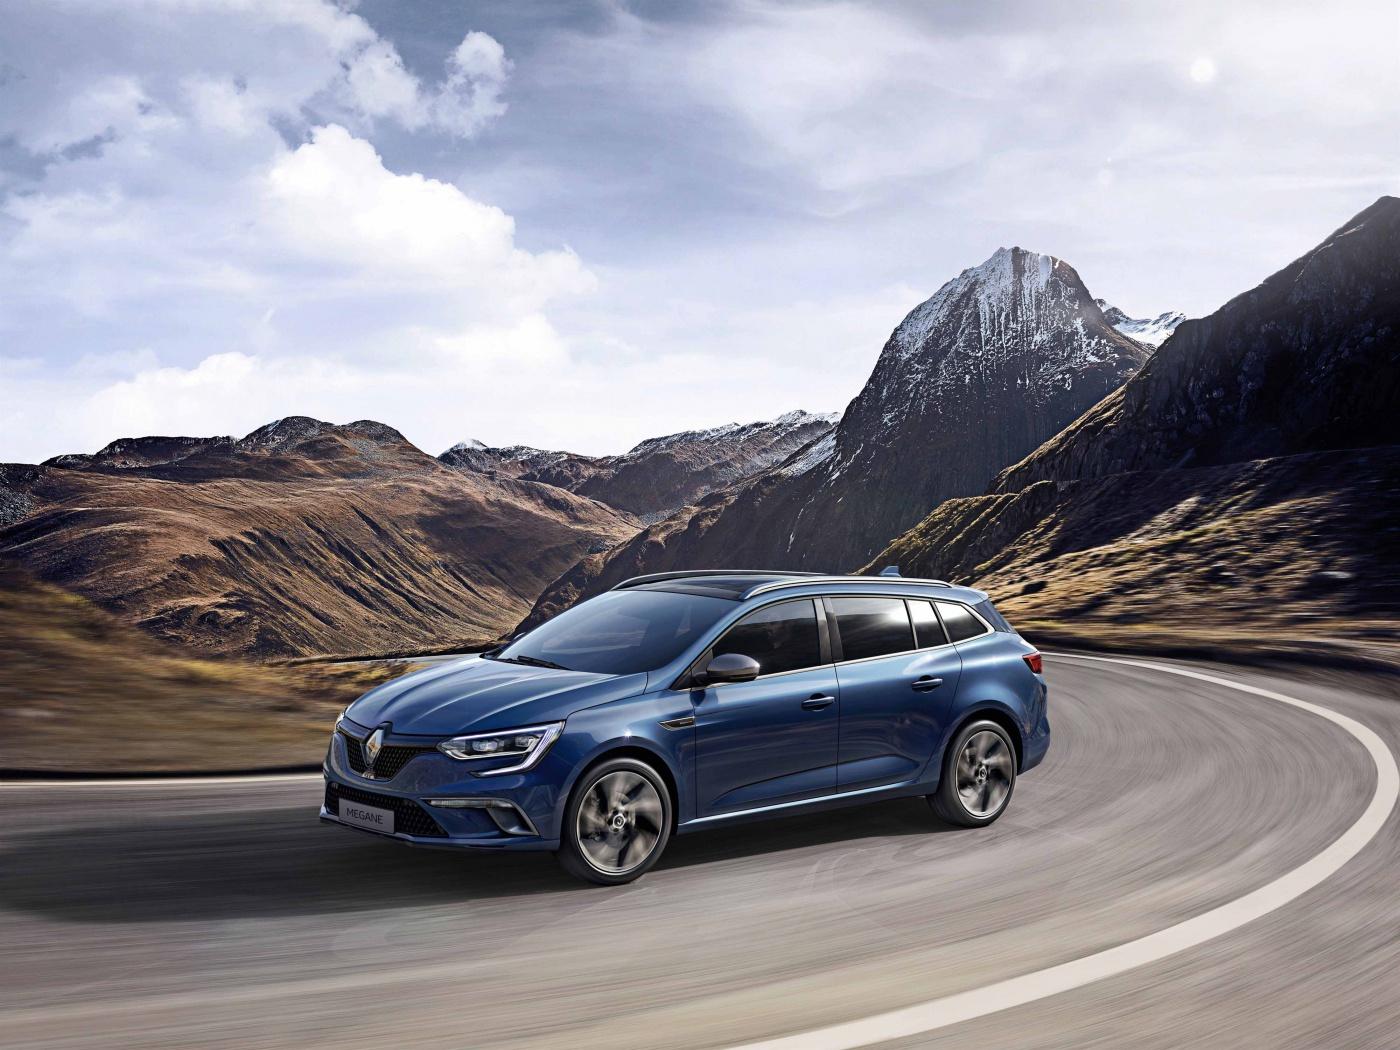 Renault_75905_global_fr